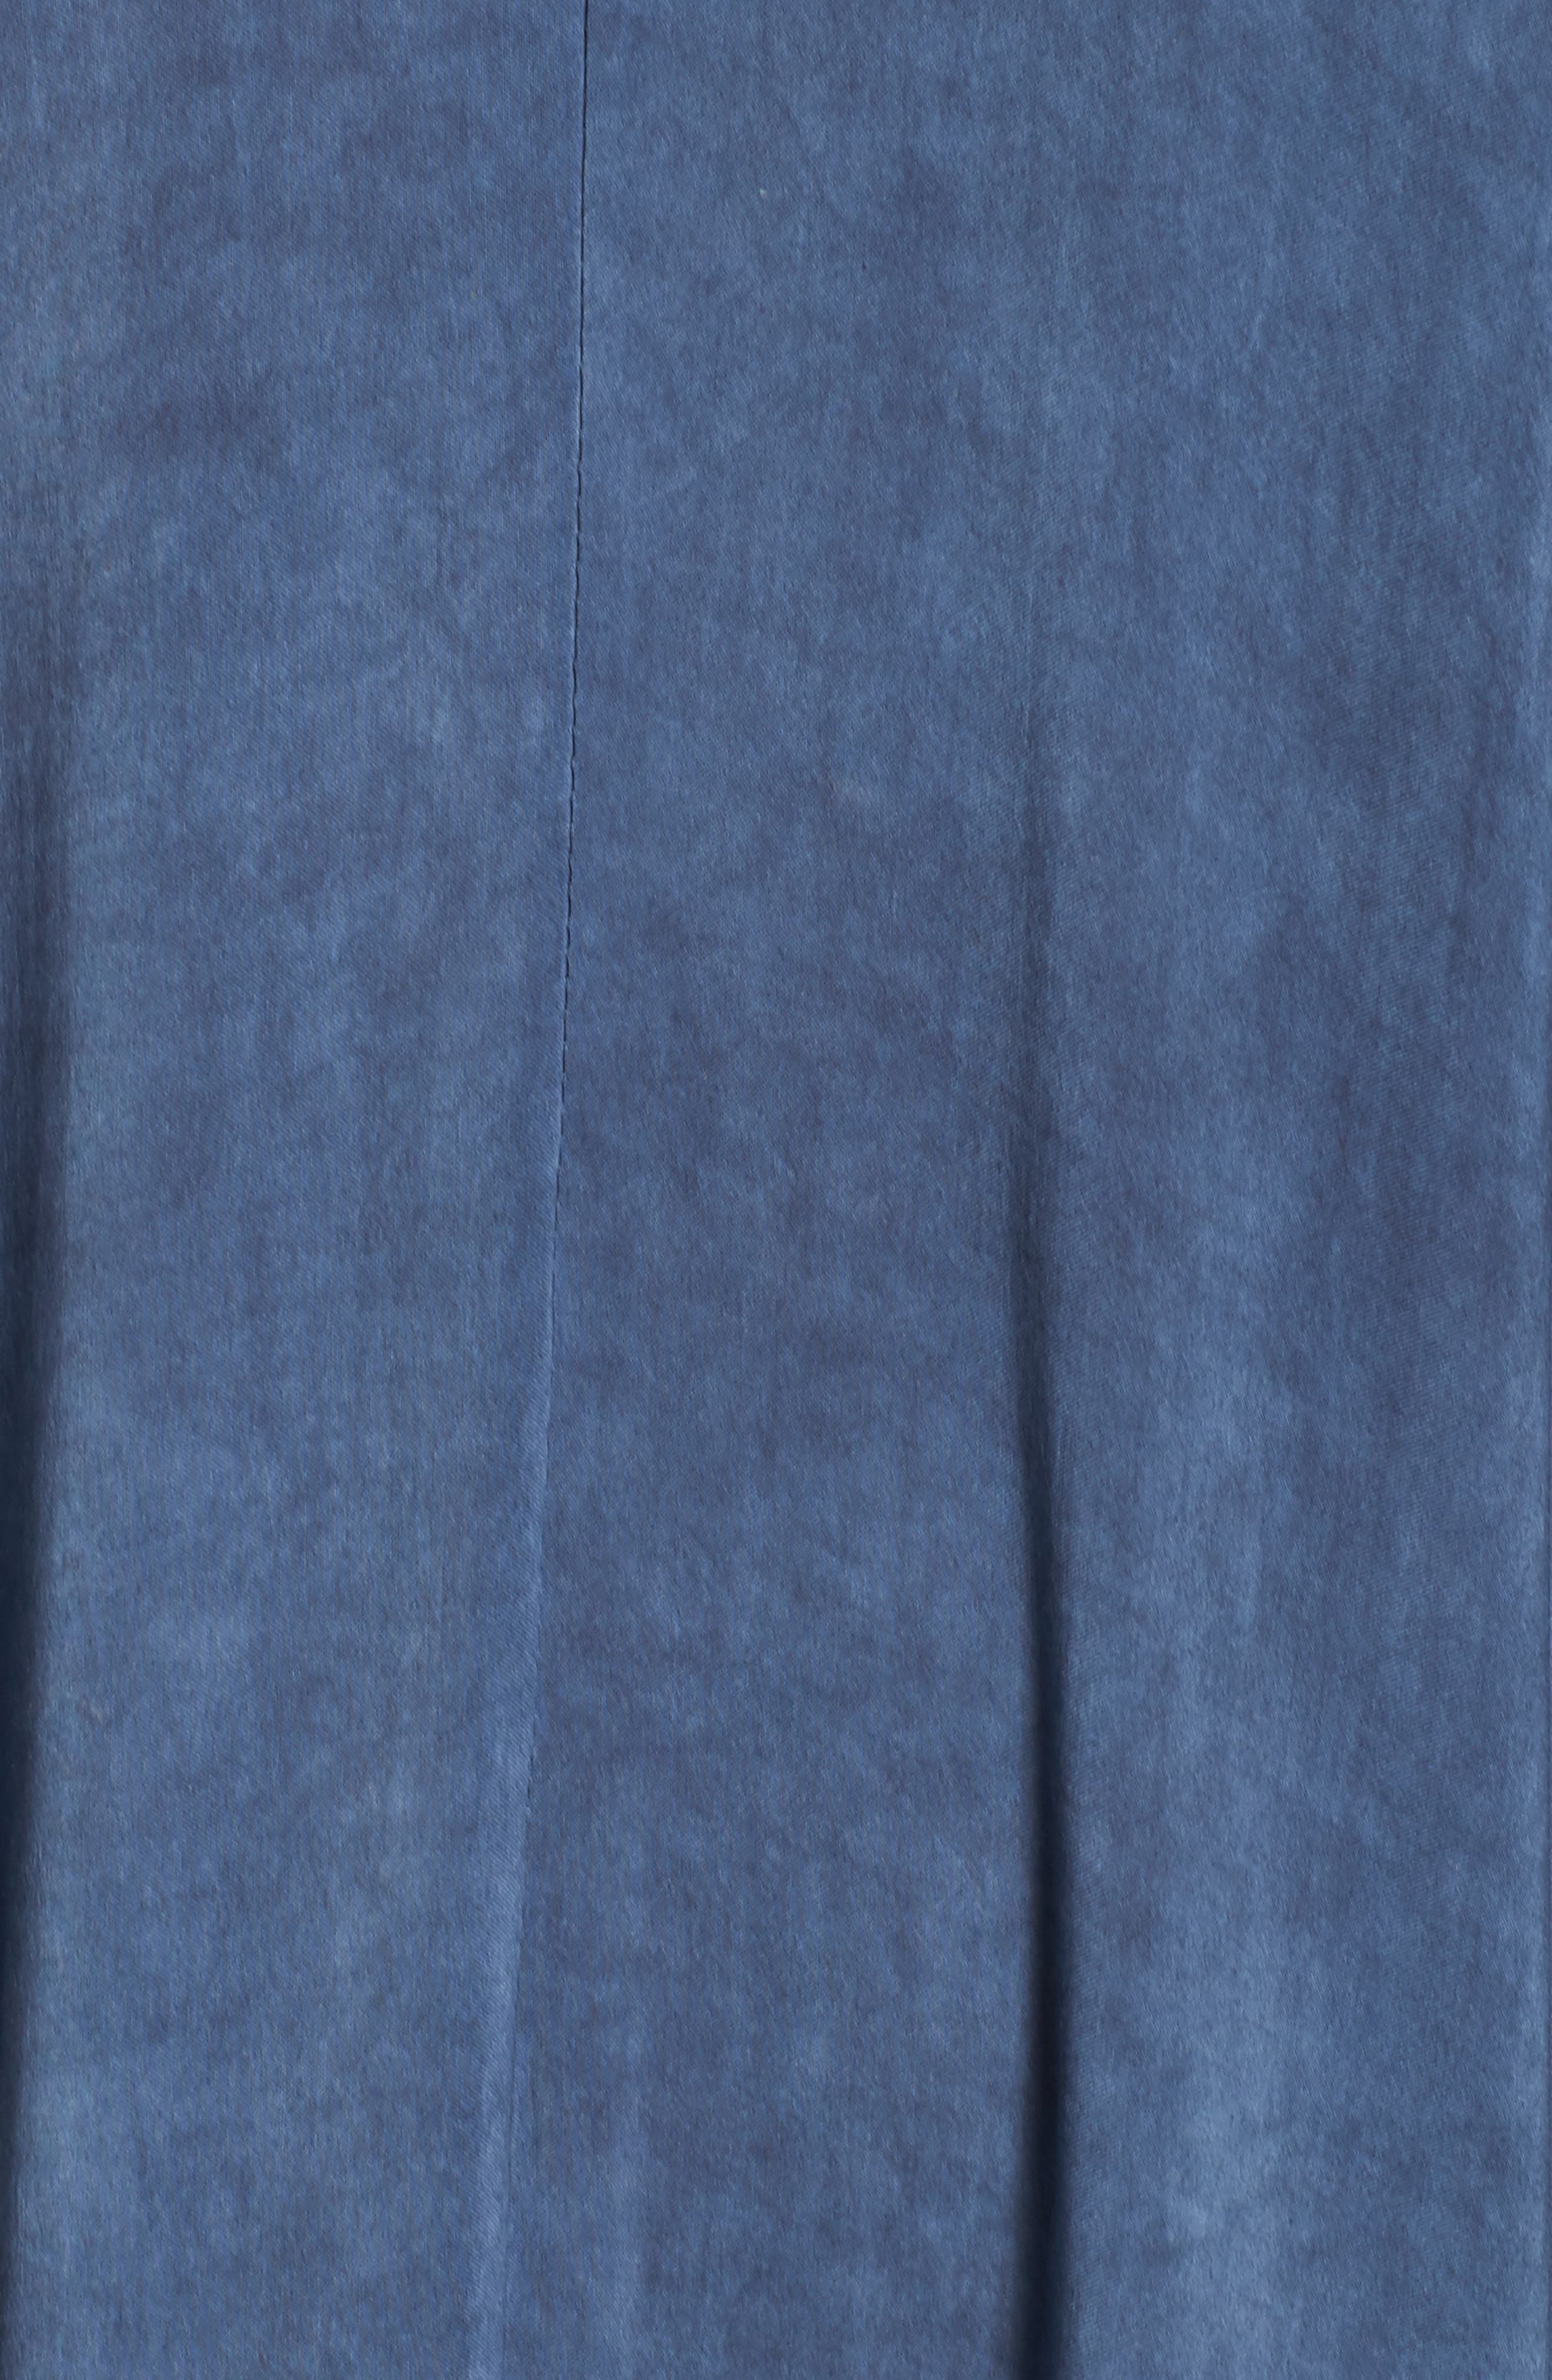 Cover-Up Maxi Dress,                             Alternate thumbnail 5, color,                             Indigo